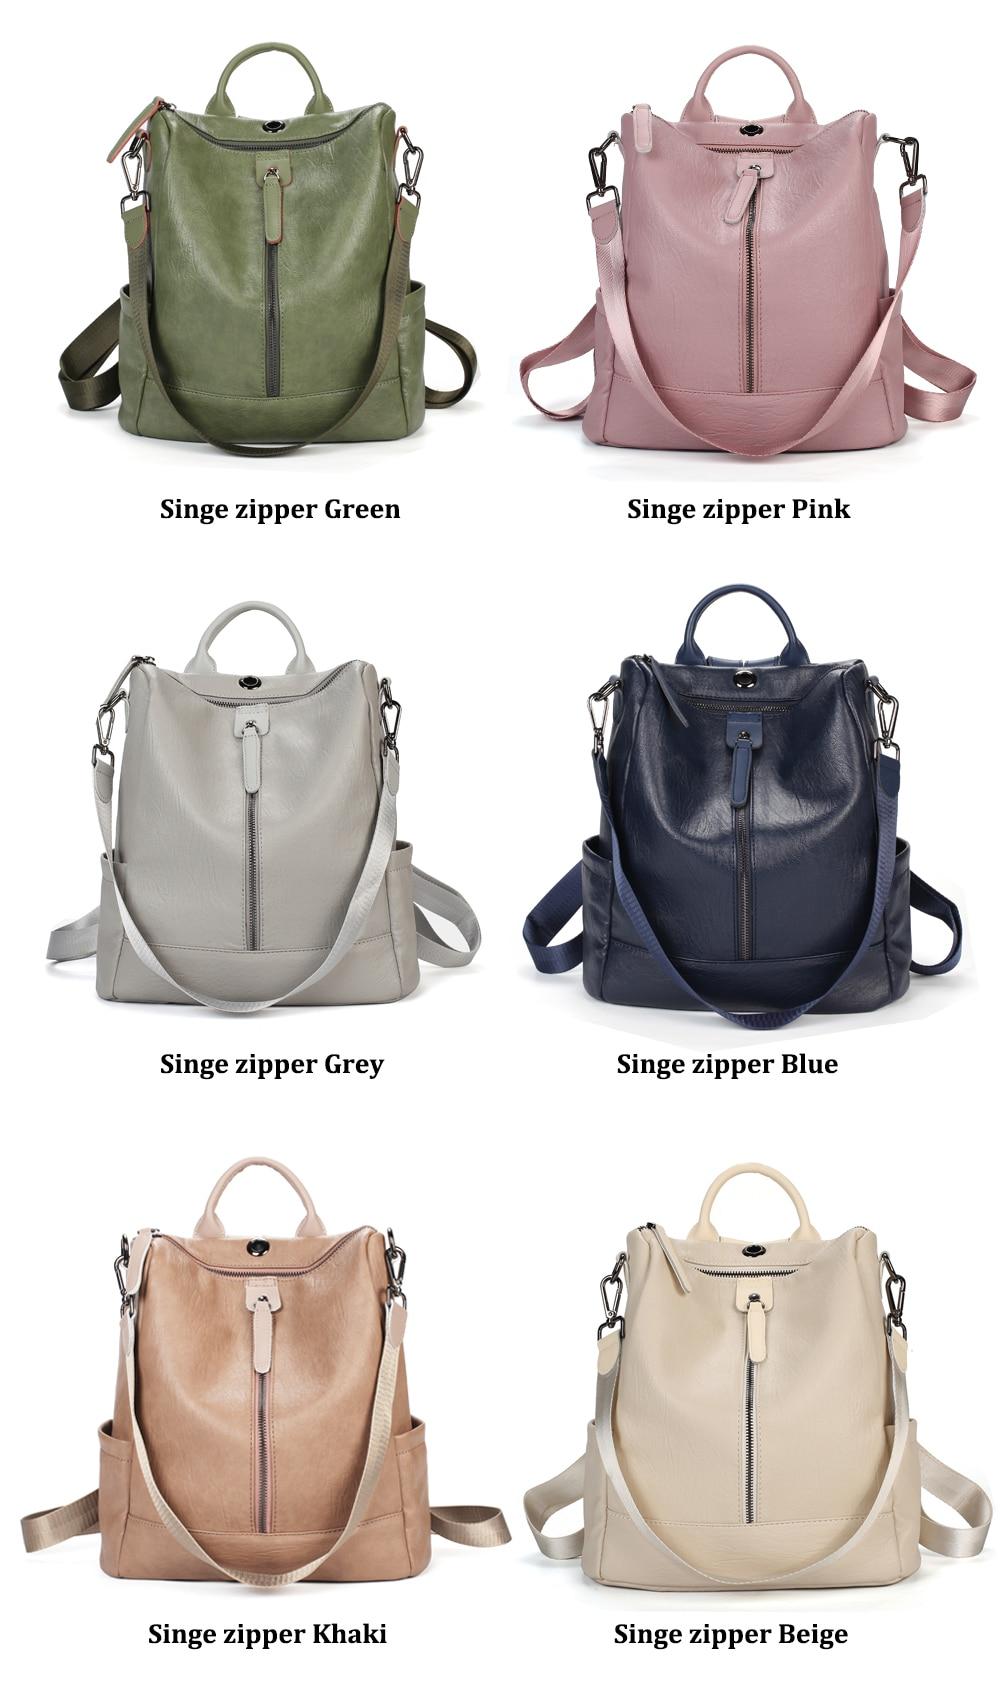 H5b805195a64744868f52d7367b7ddaddQ Female backpack mochila feminina casual Multifunction Women Leather Backpack Female Shoulder Bag Sac A Dos Travel Back Pack